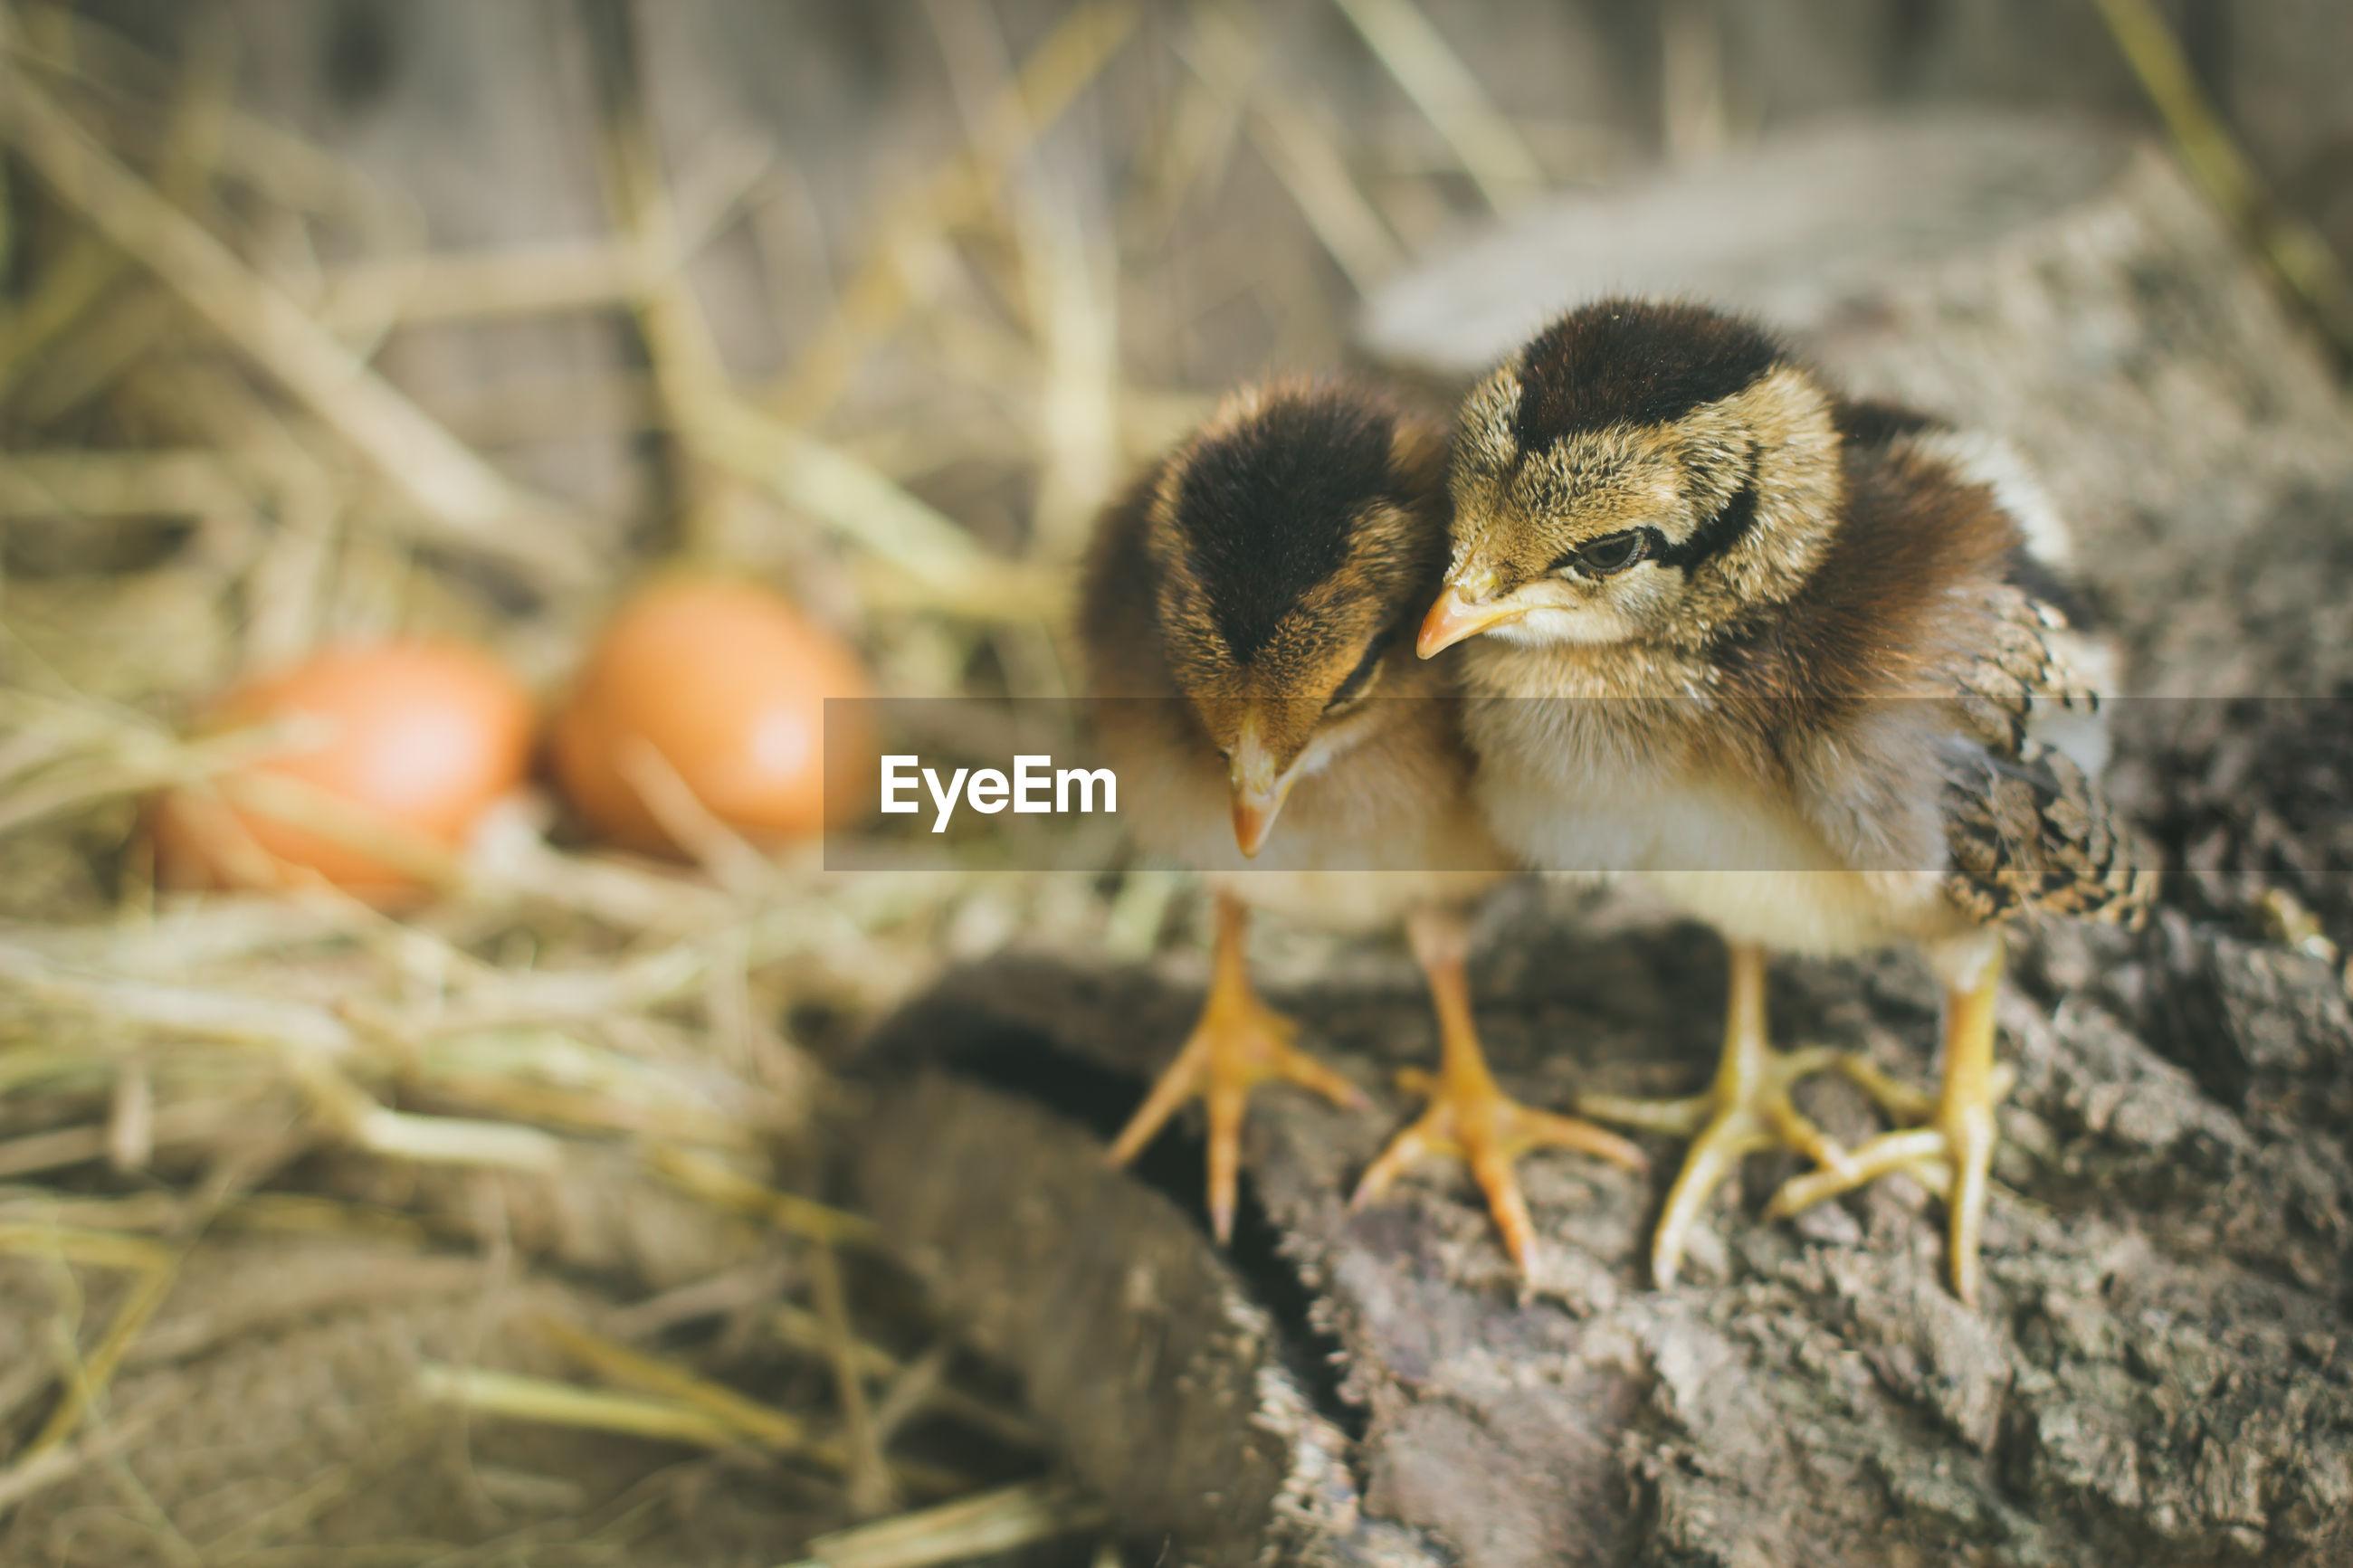 Close-up of chicks at farm